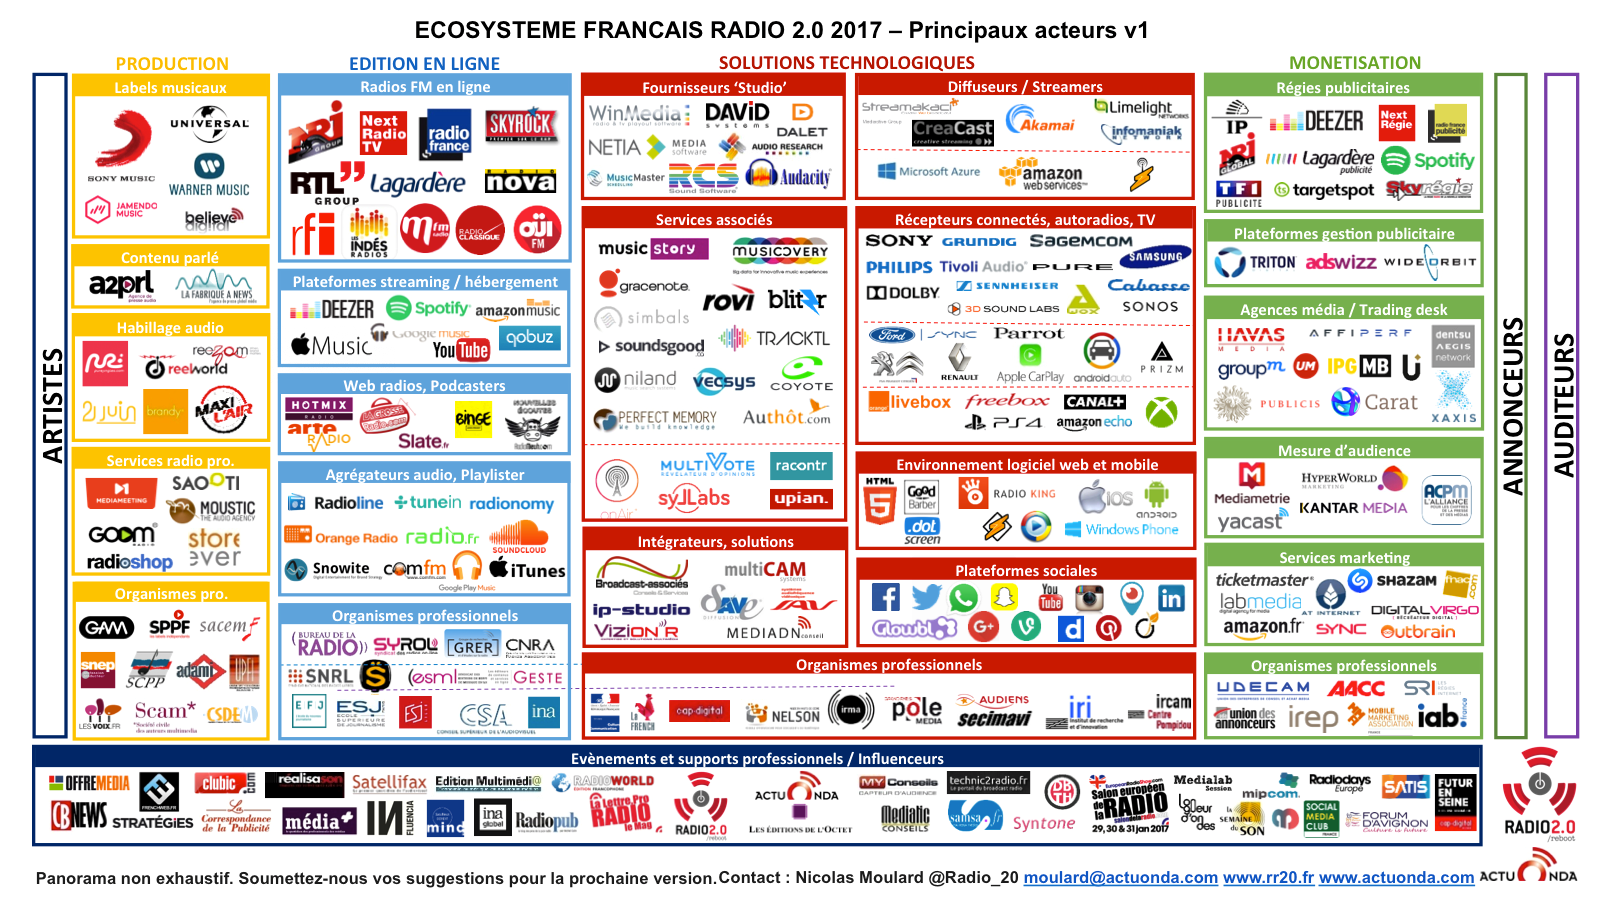 Ecosysteme-francais-Radio-20-2017